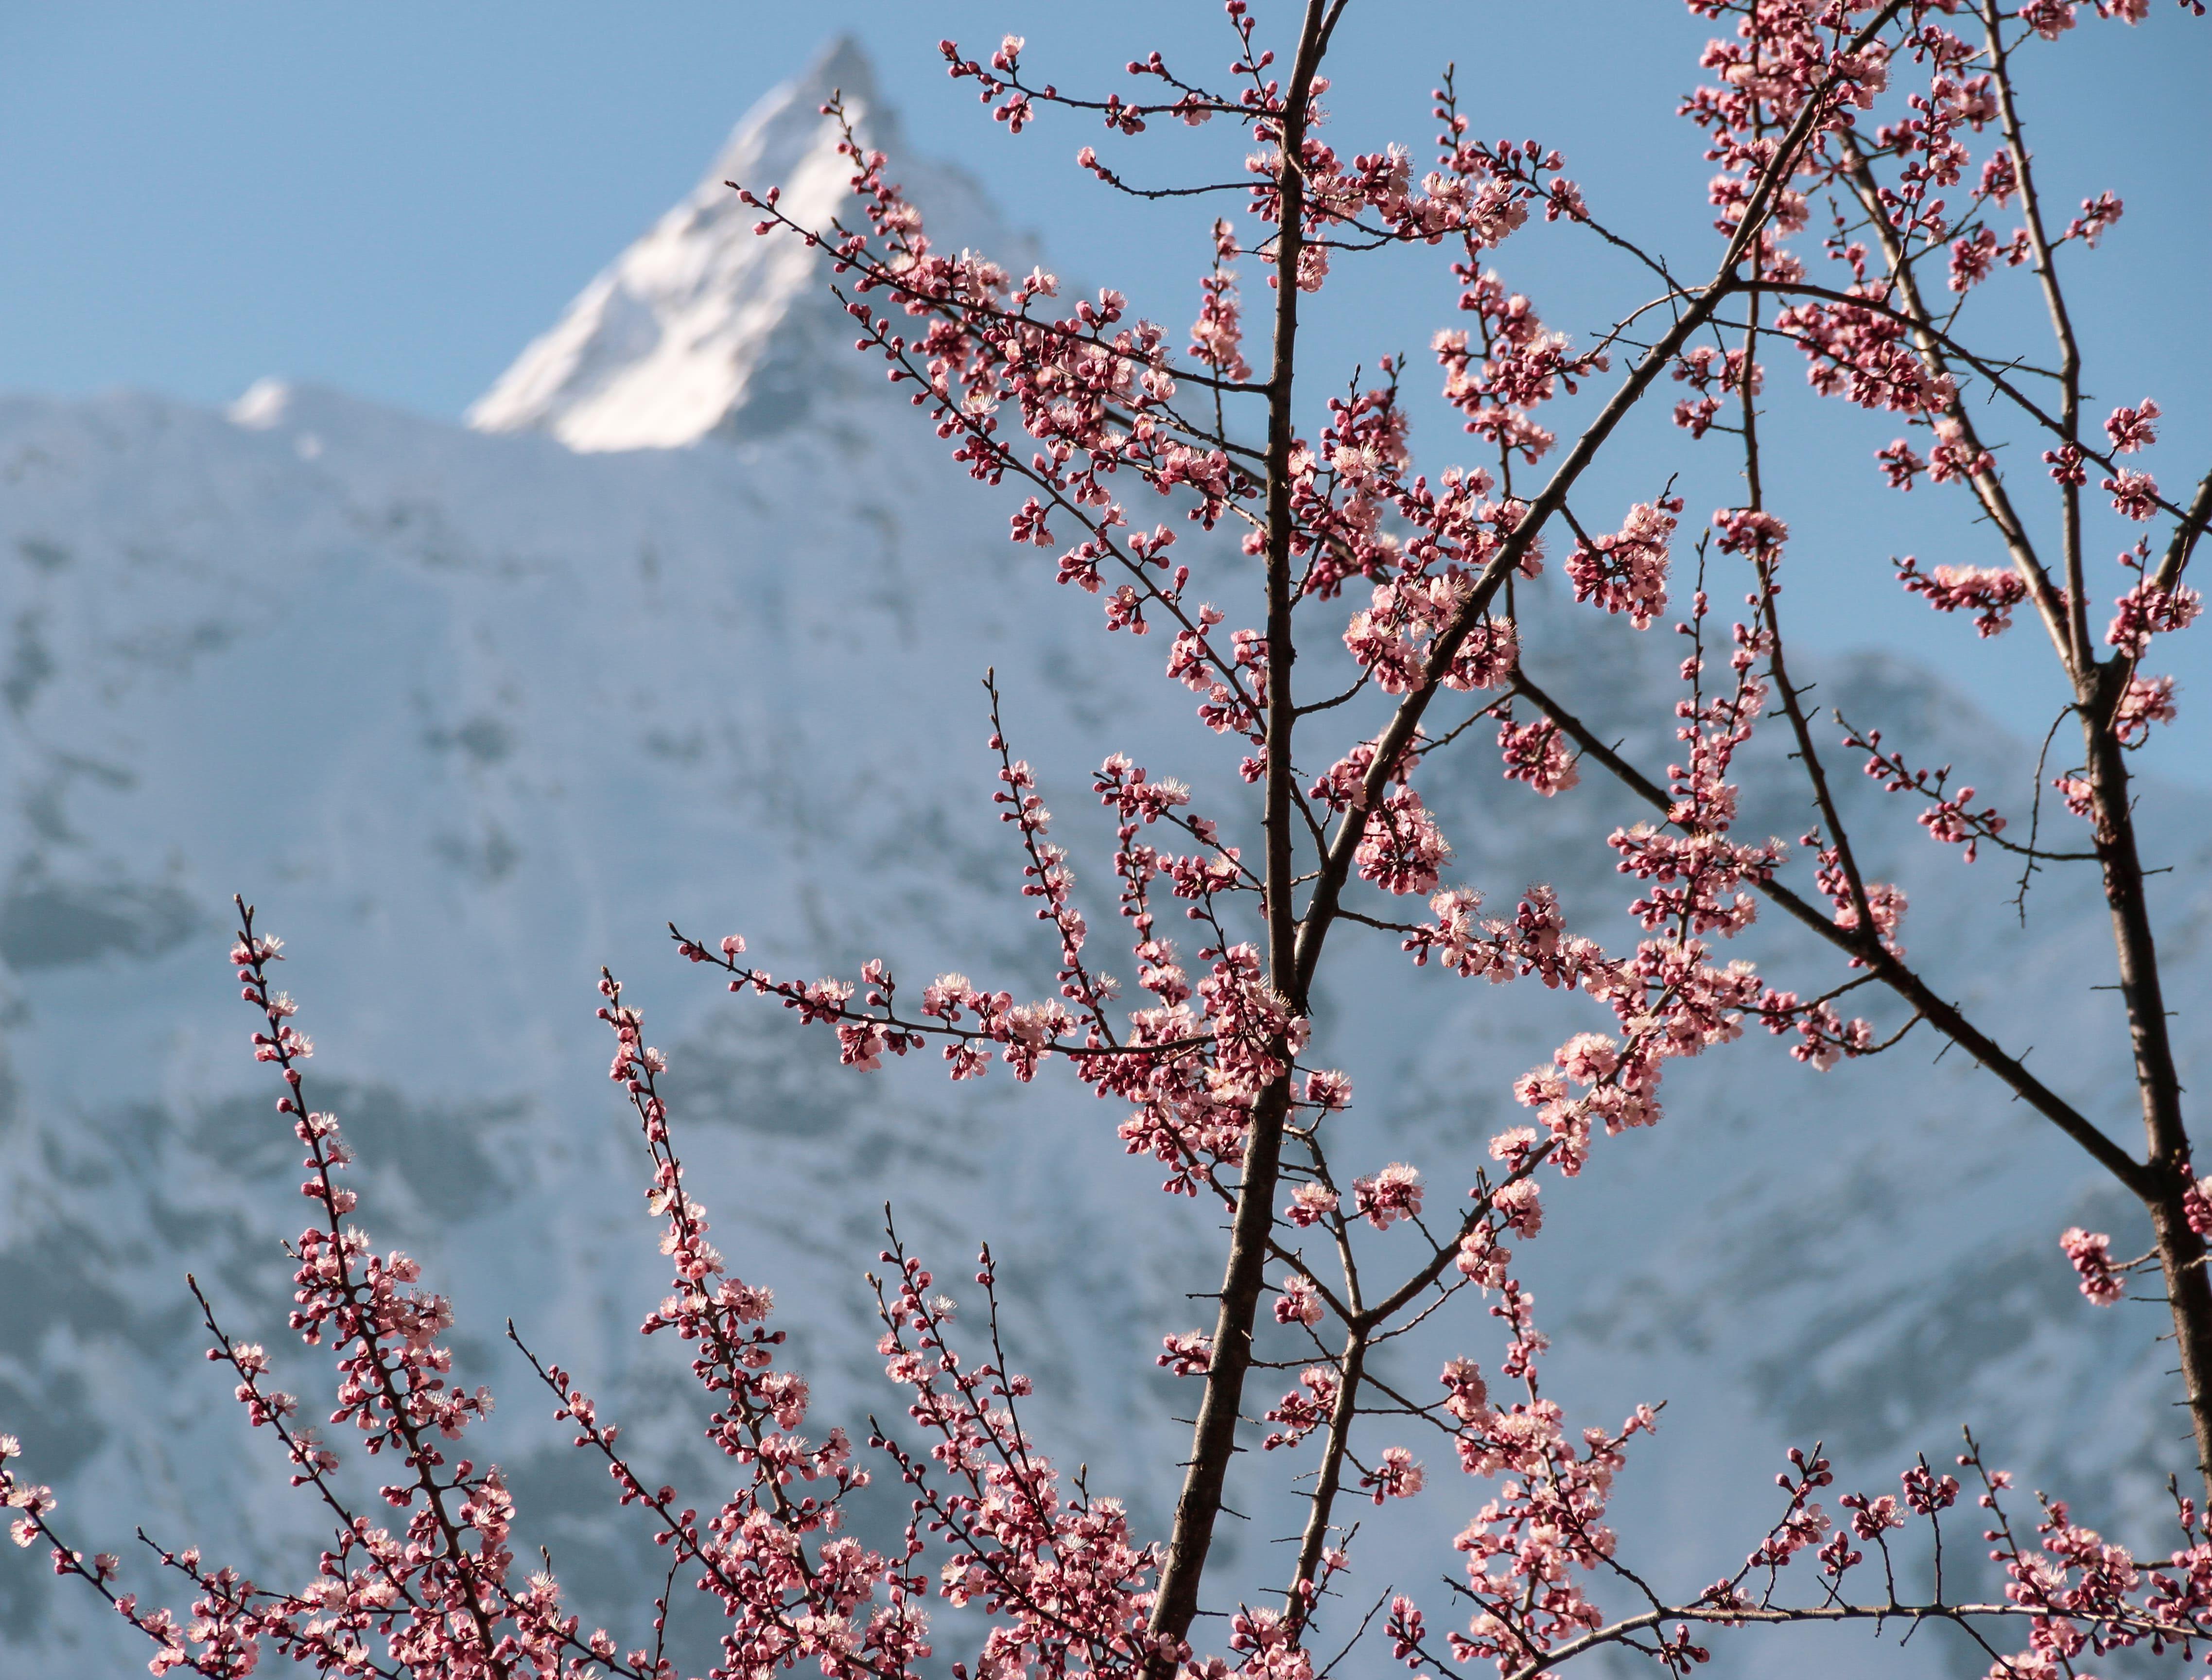 Weather in Kalpa